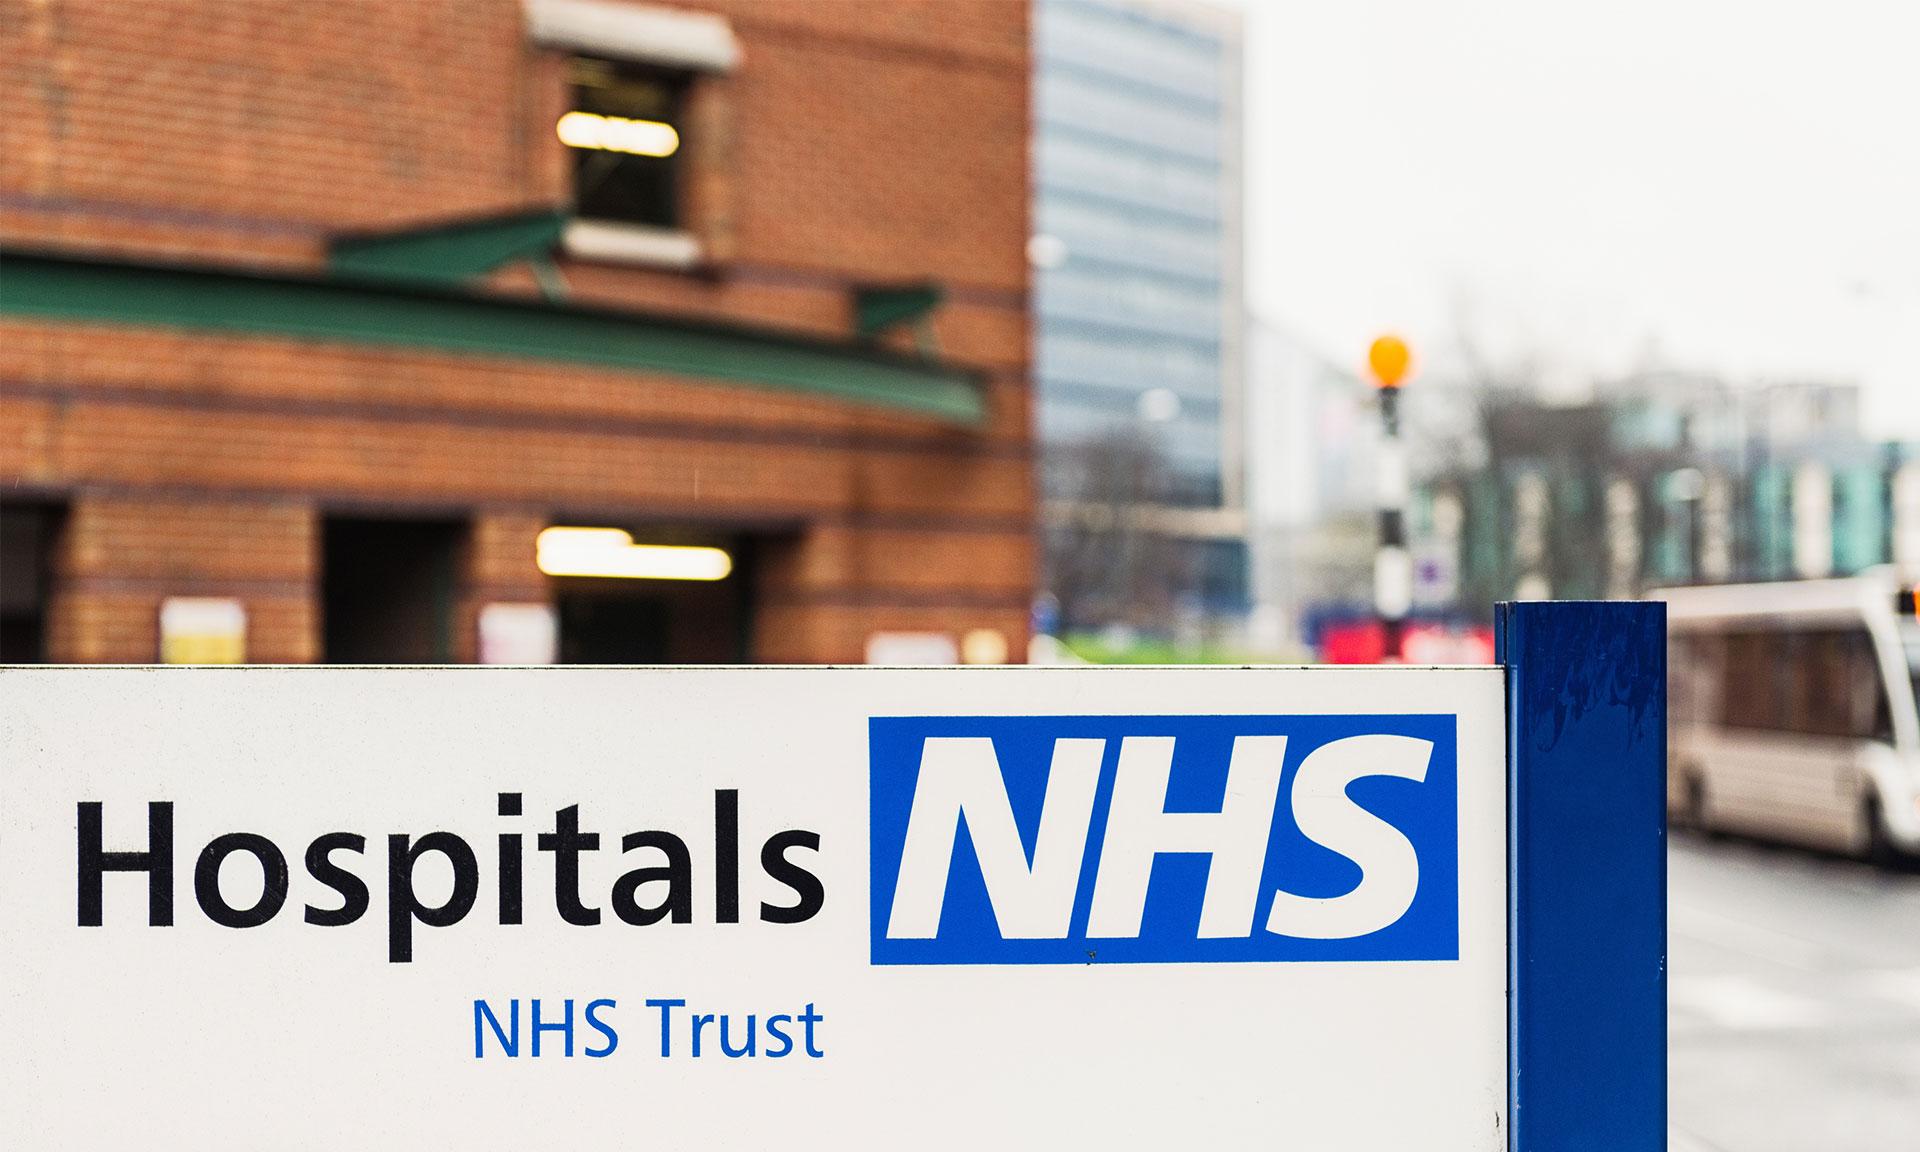 A NHS hospital sign